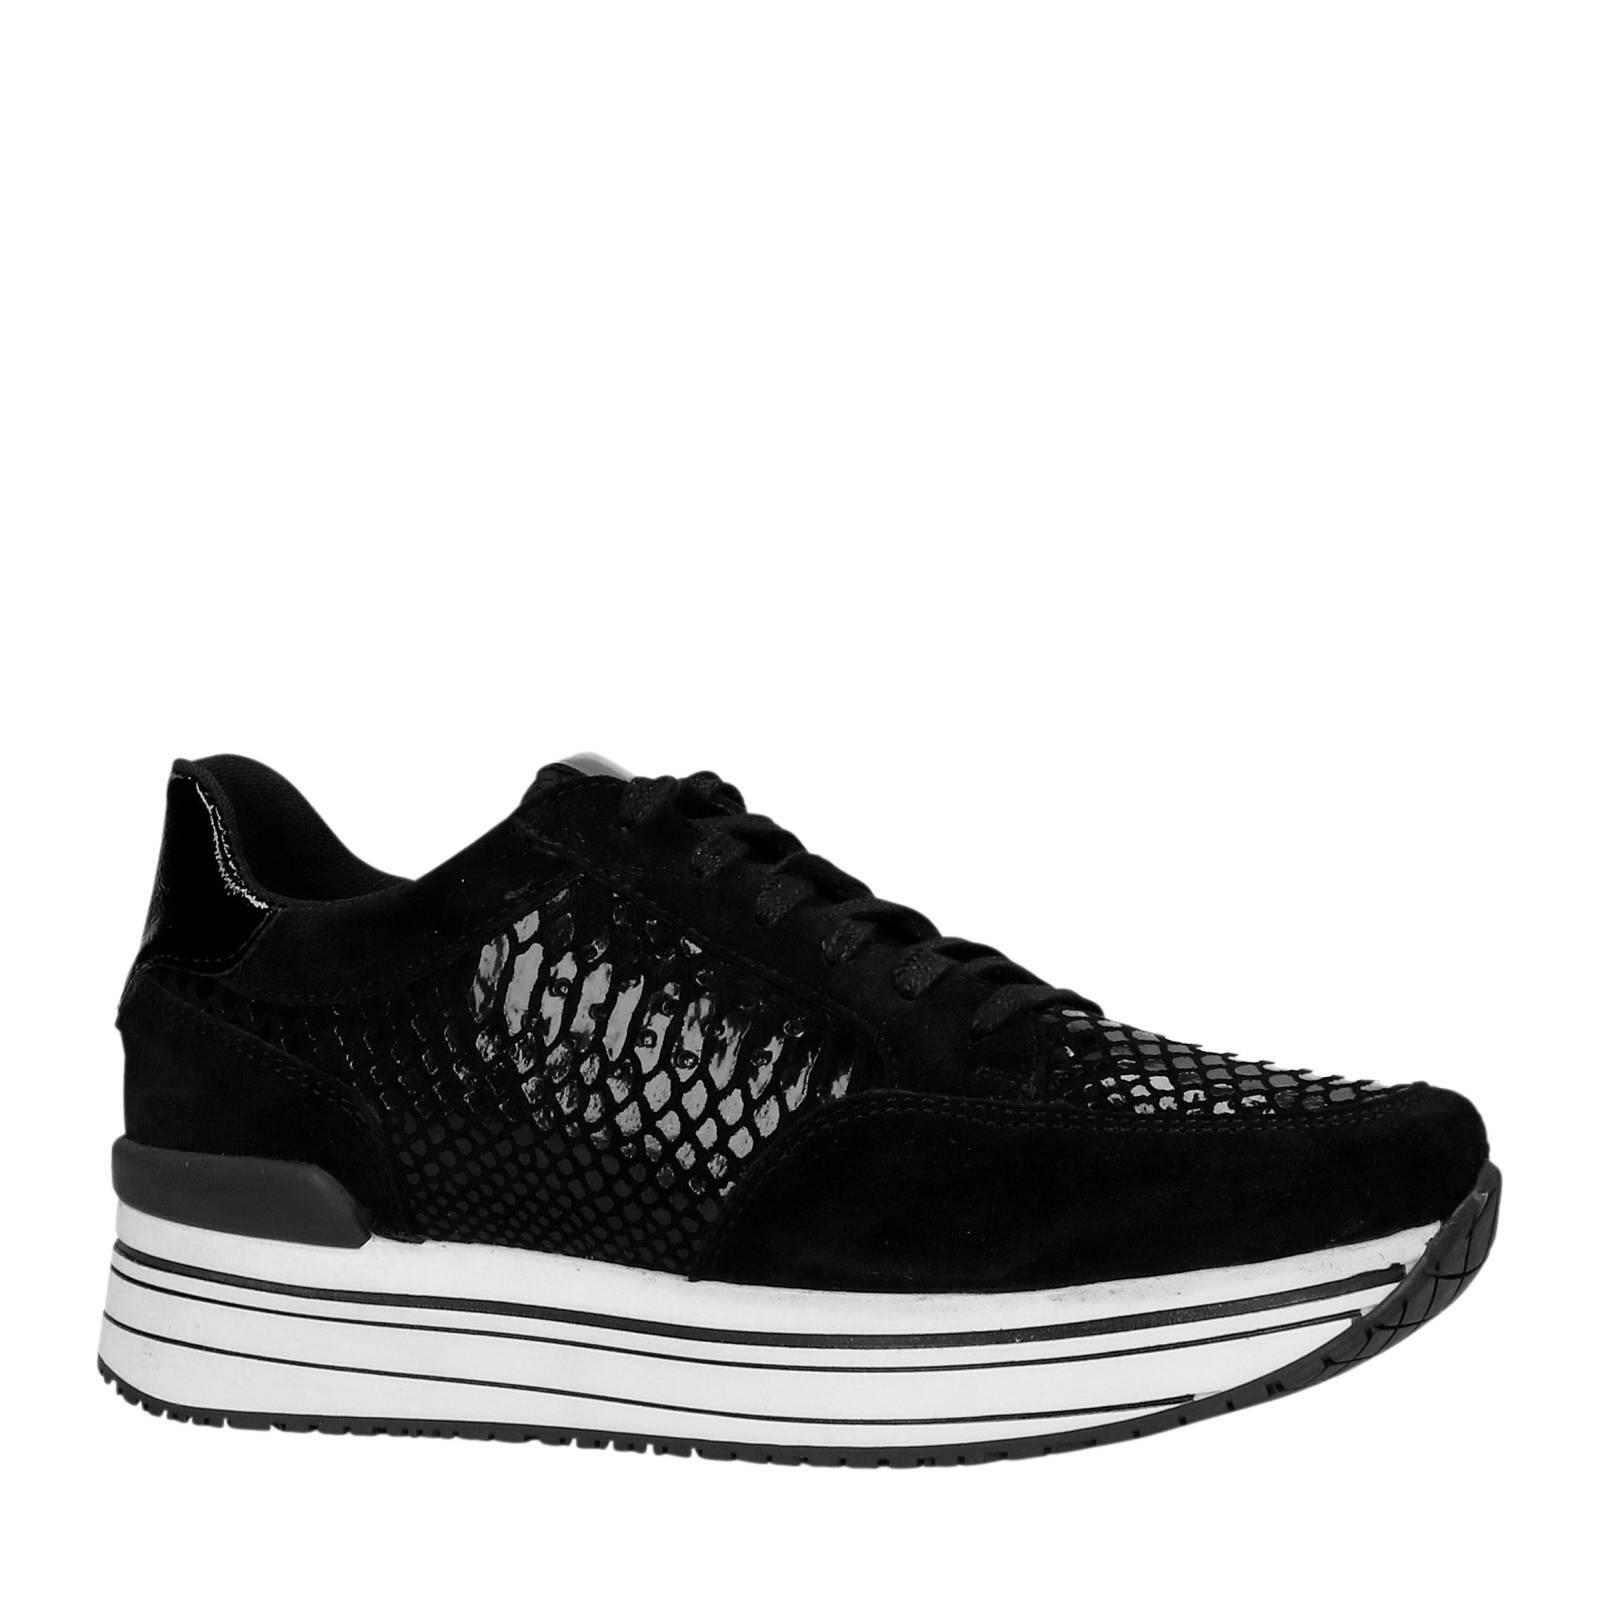 2045e1a2877 PS Poelman suède sneakers zwart | wehkamp